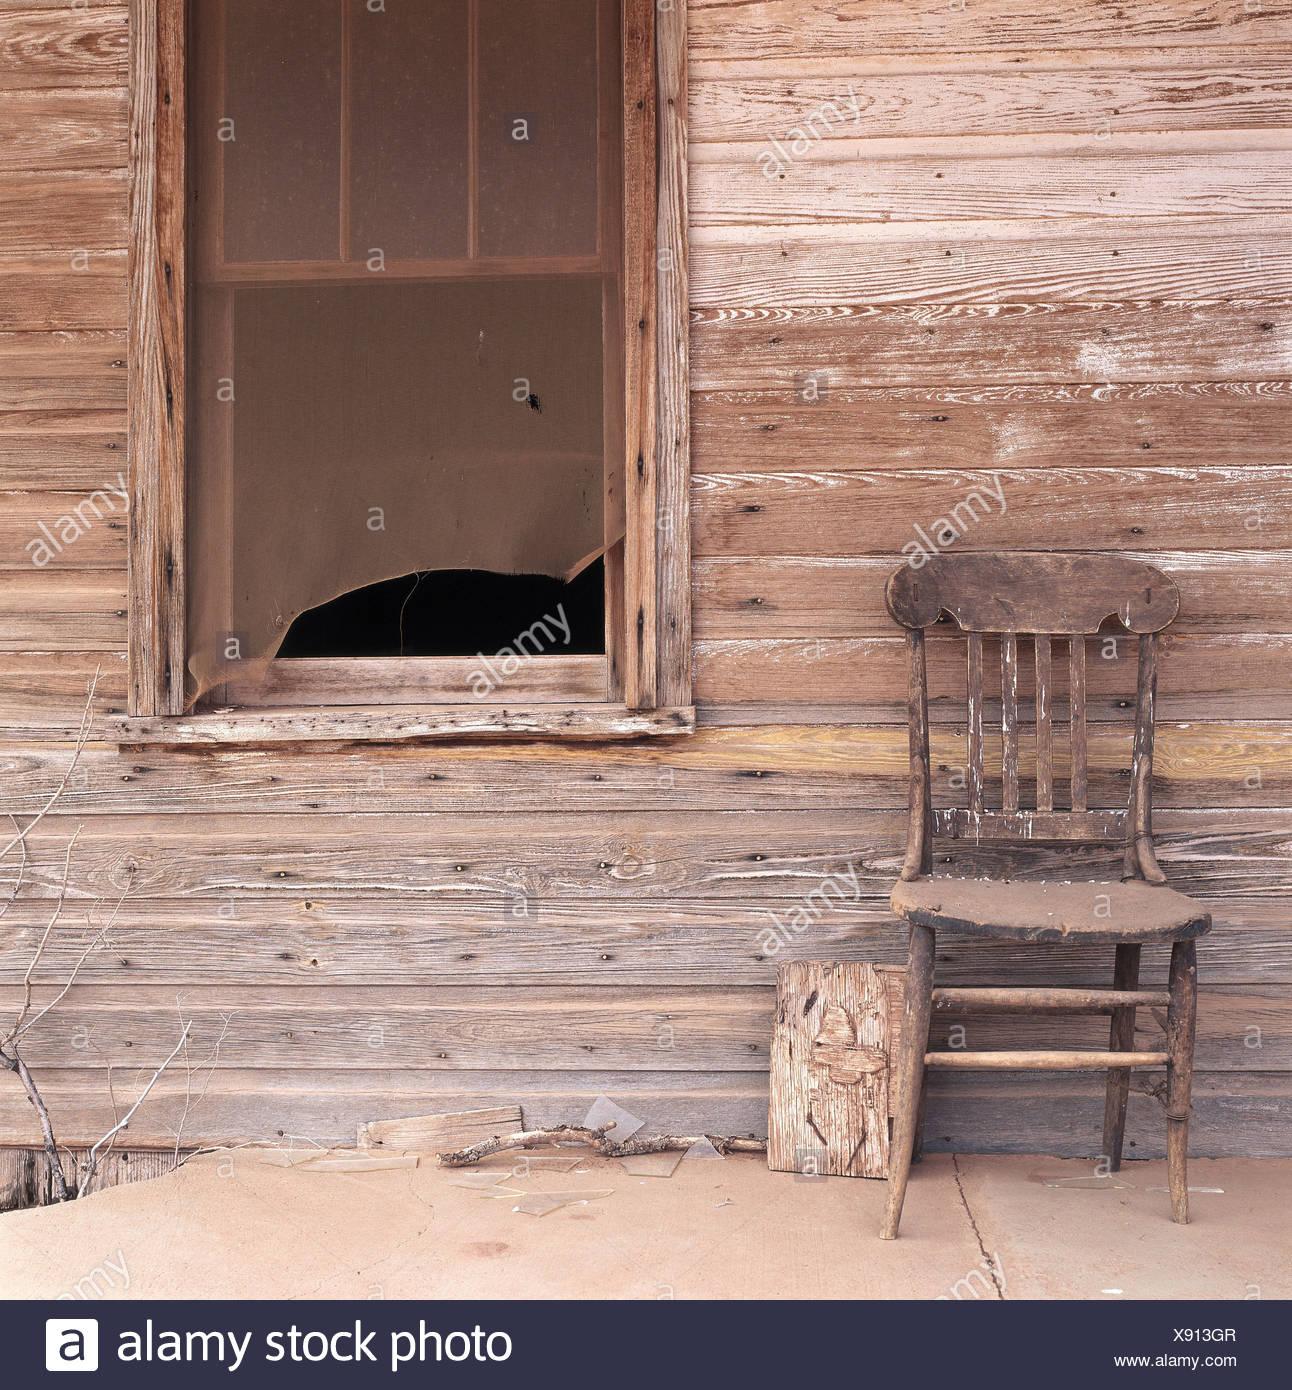 USA, New Mexico, Holzhaus, Wand, Fenster, Stuhl, alte, Amerika